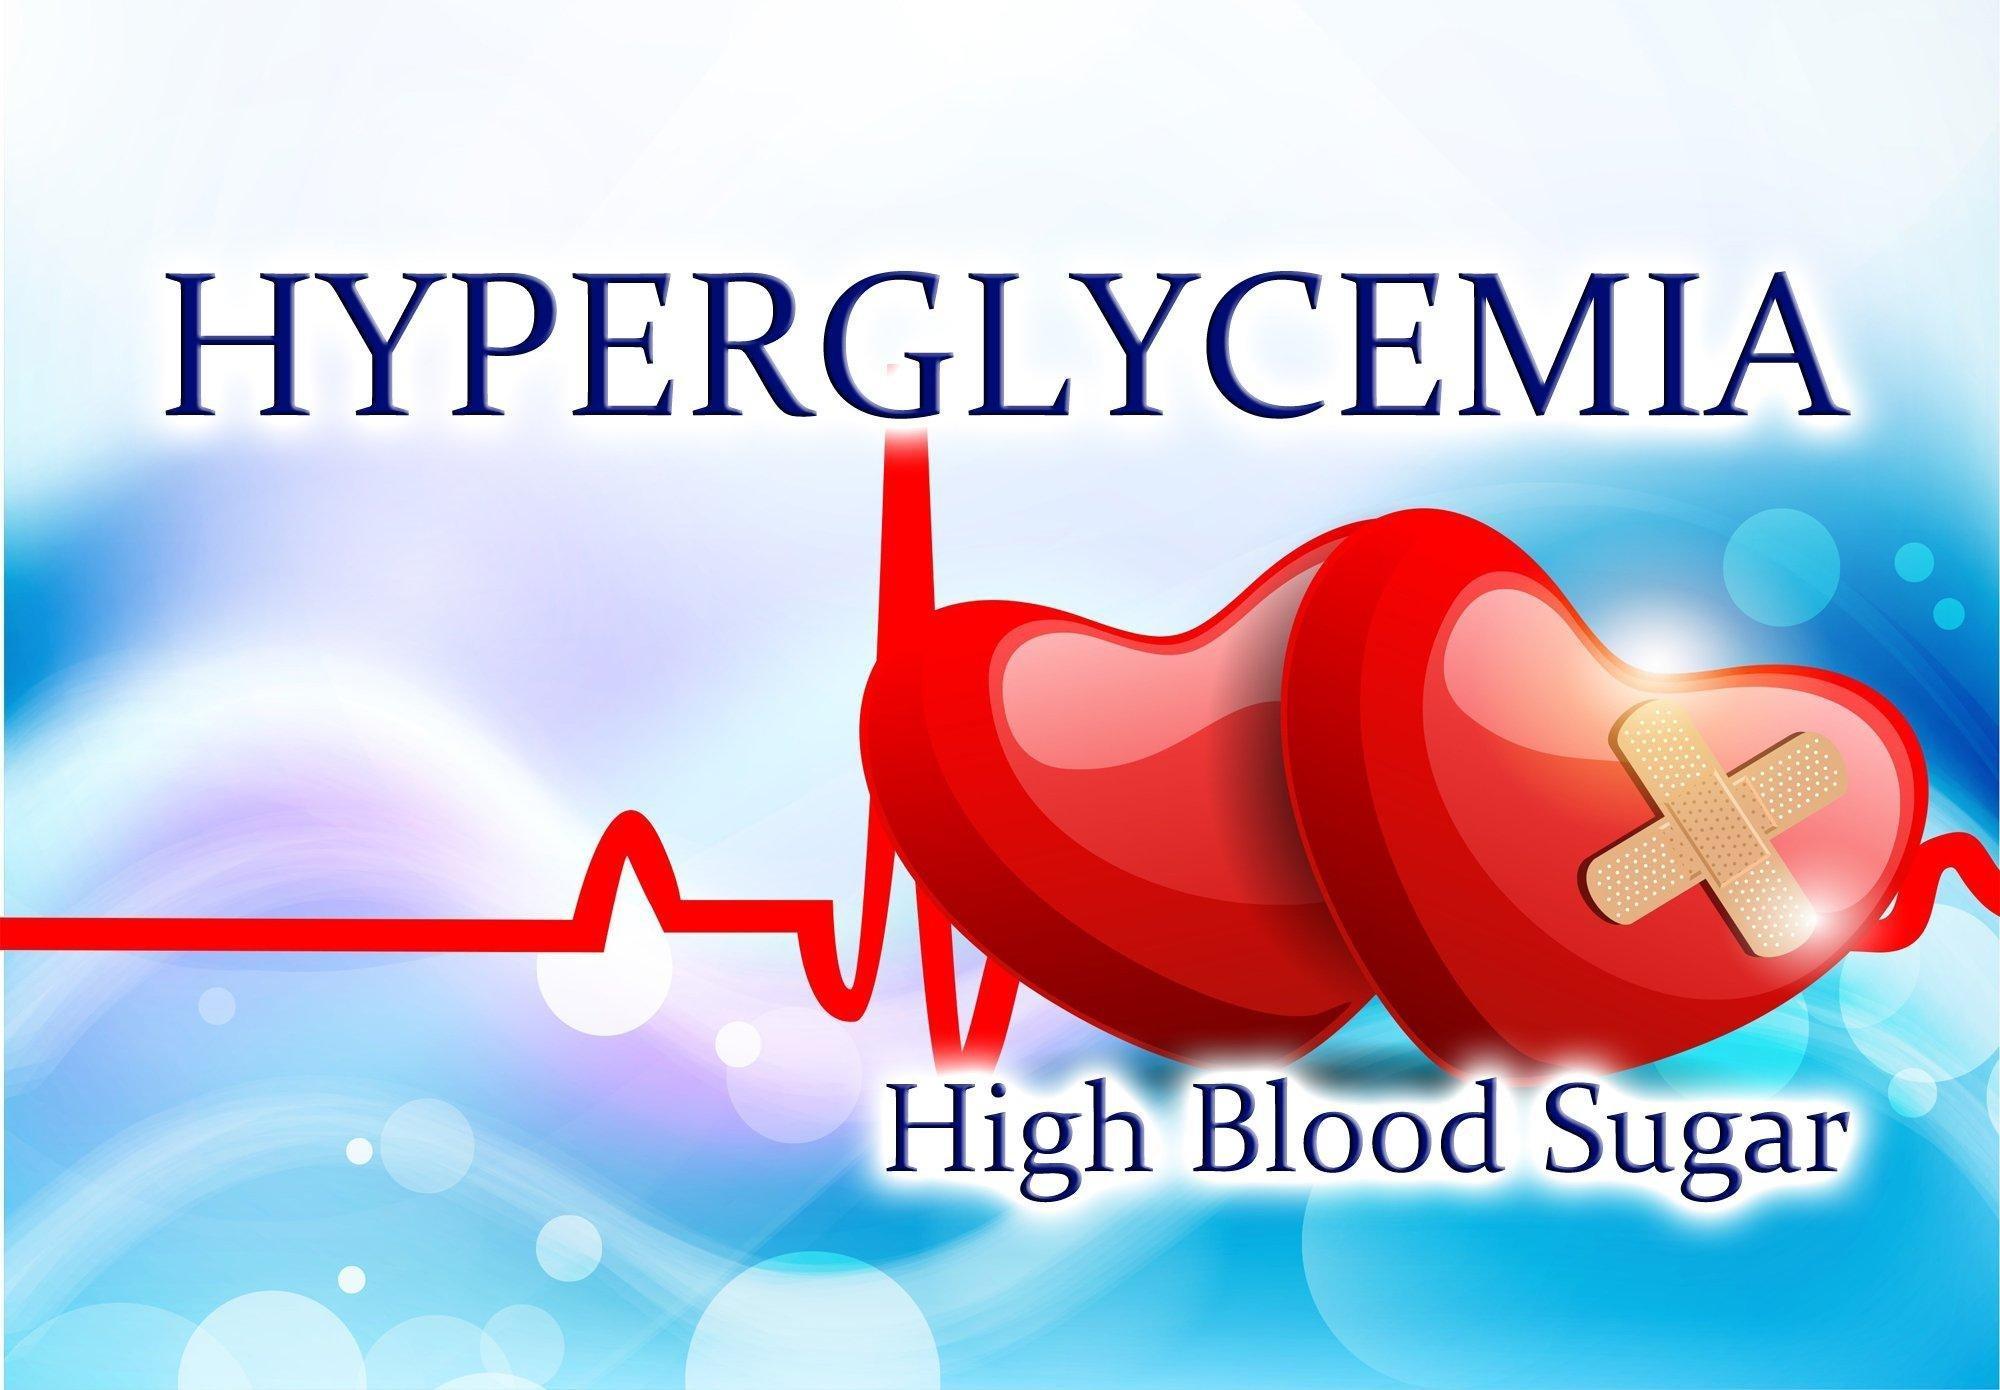 High Blood Sugar, Hyperglycemia Causes | Prediabetes